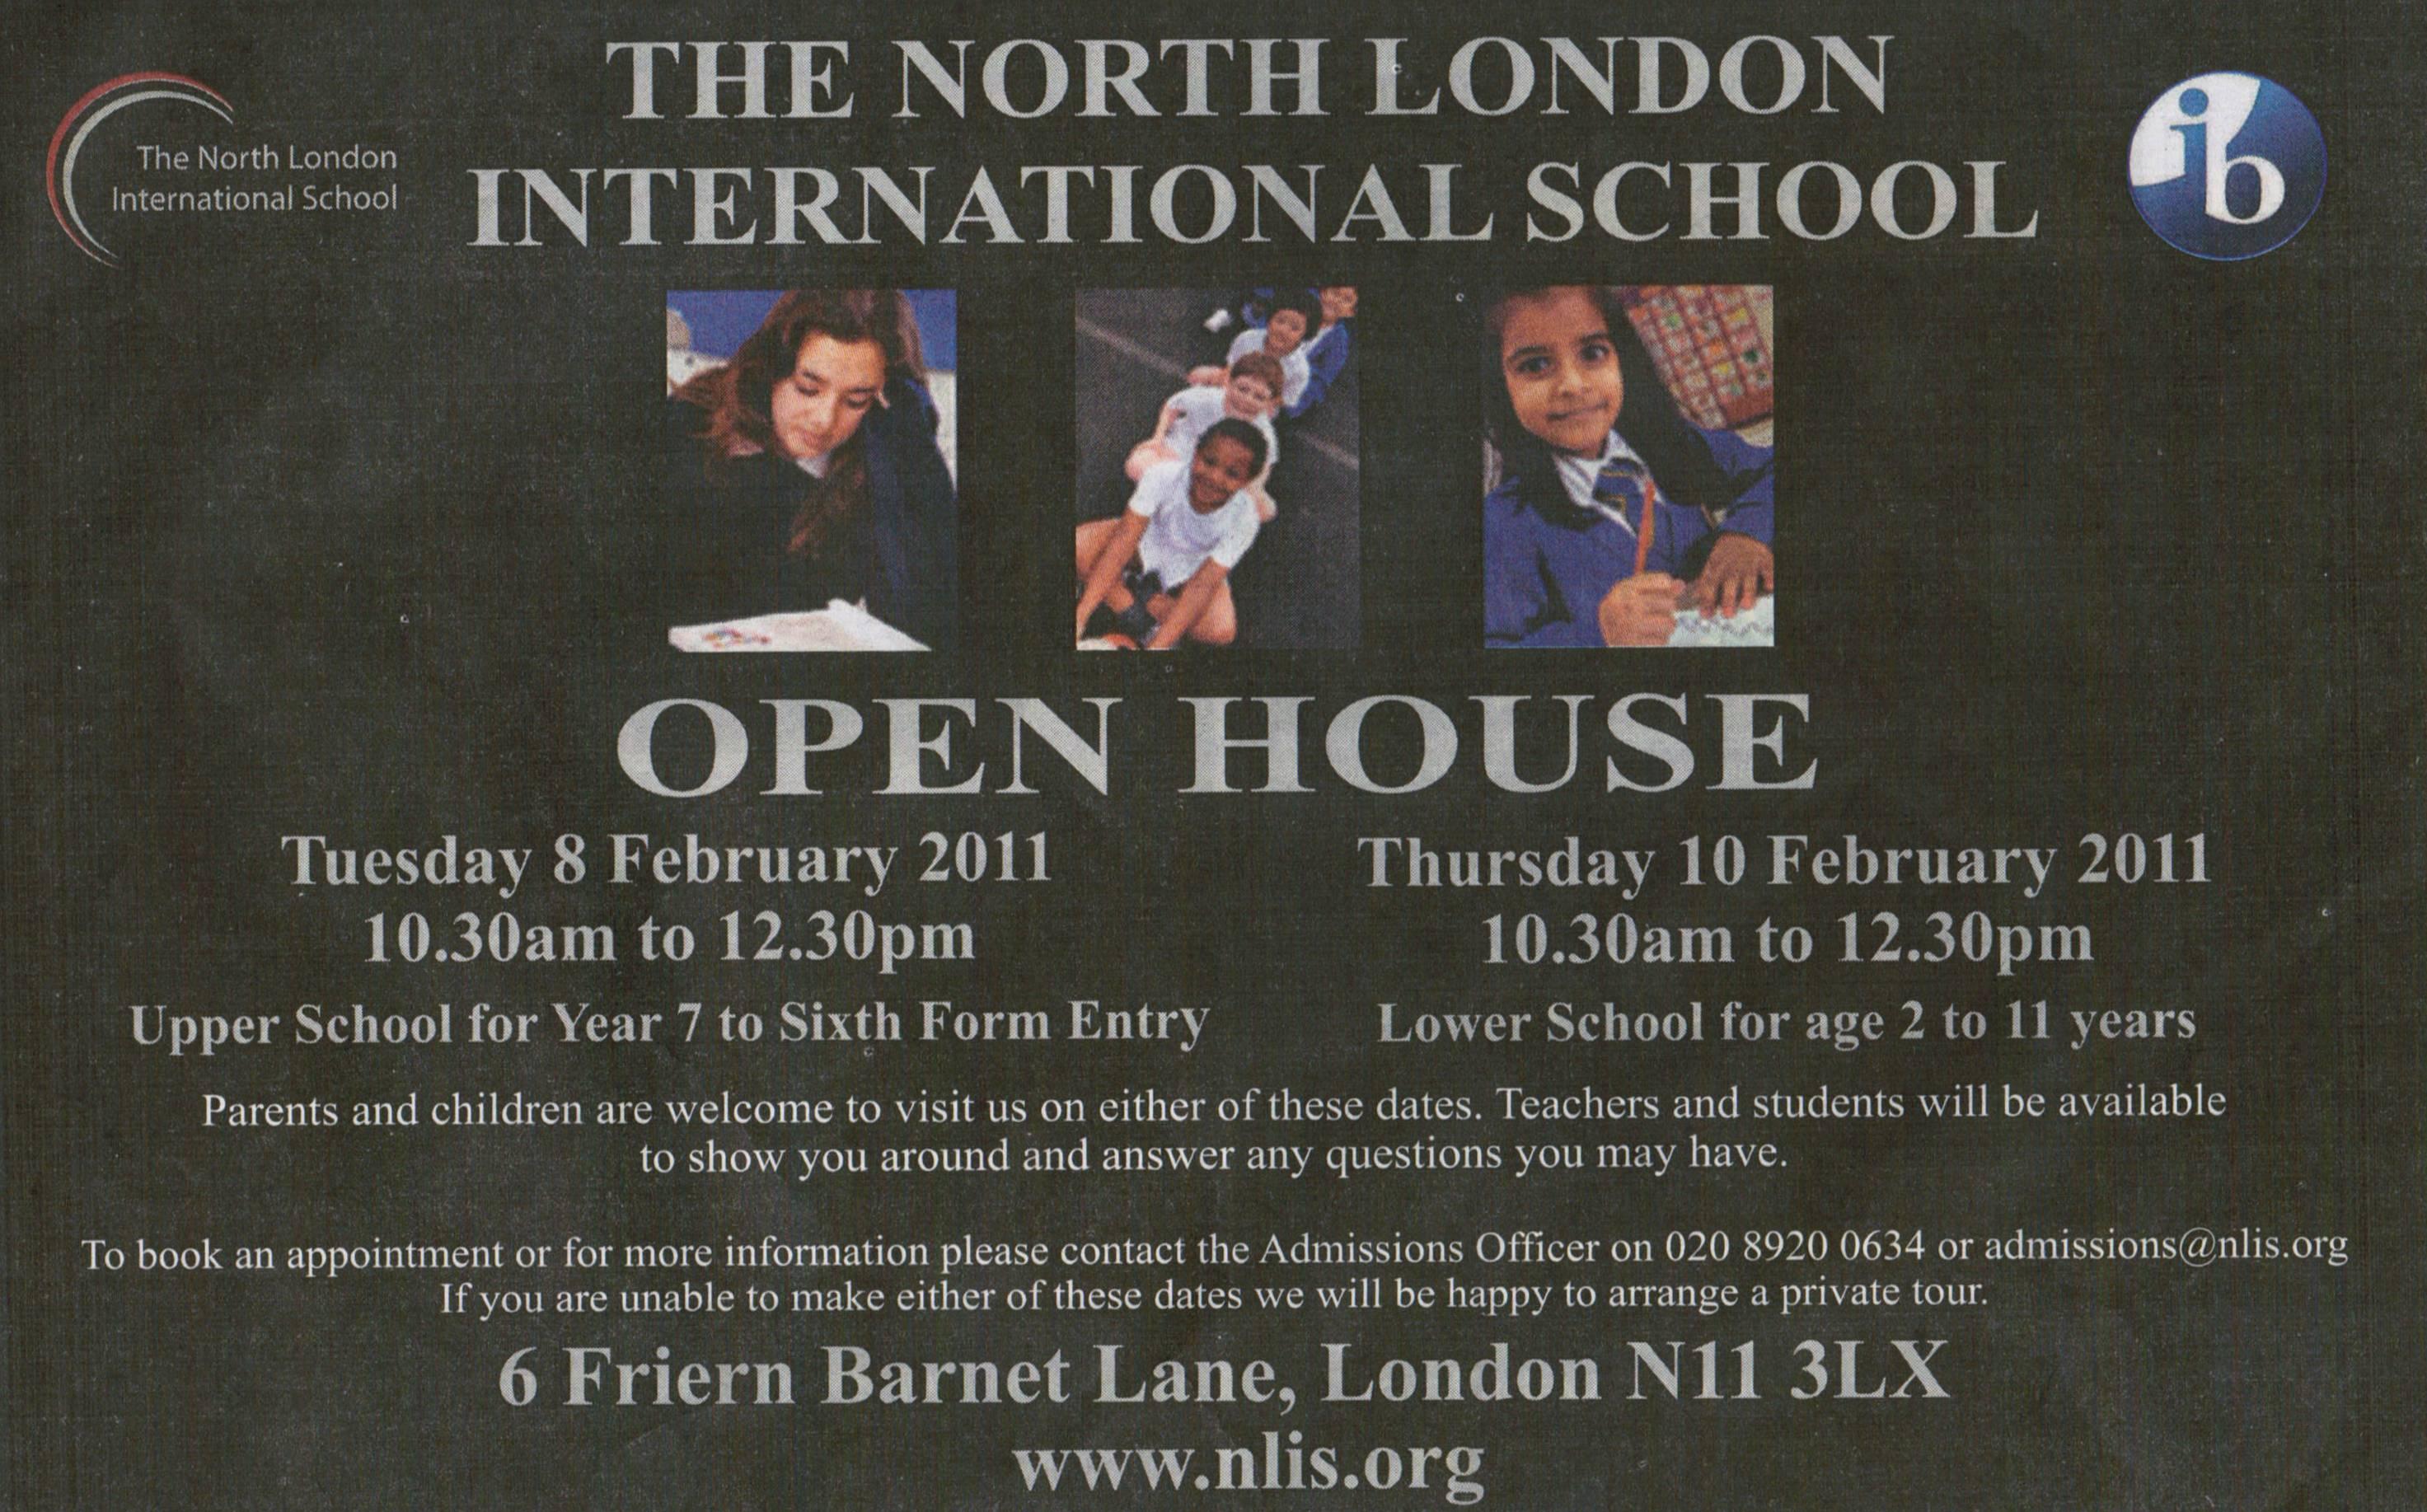 North London International School